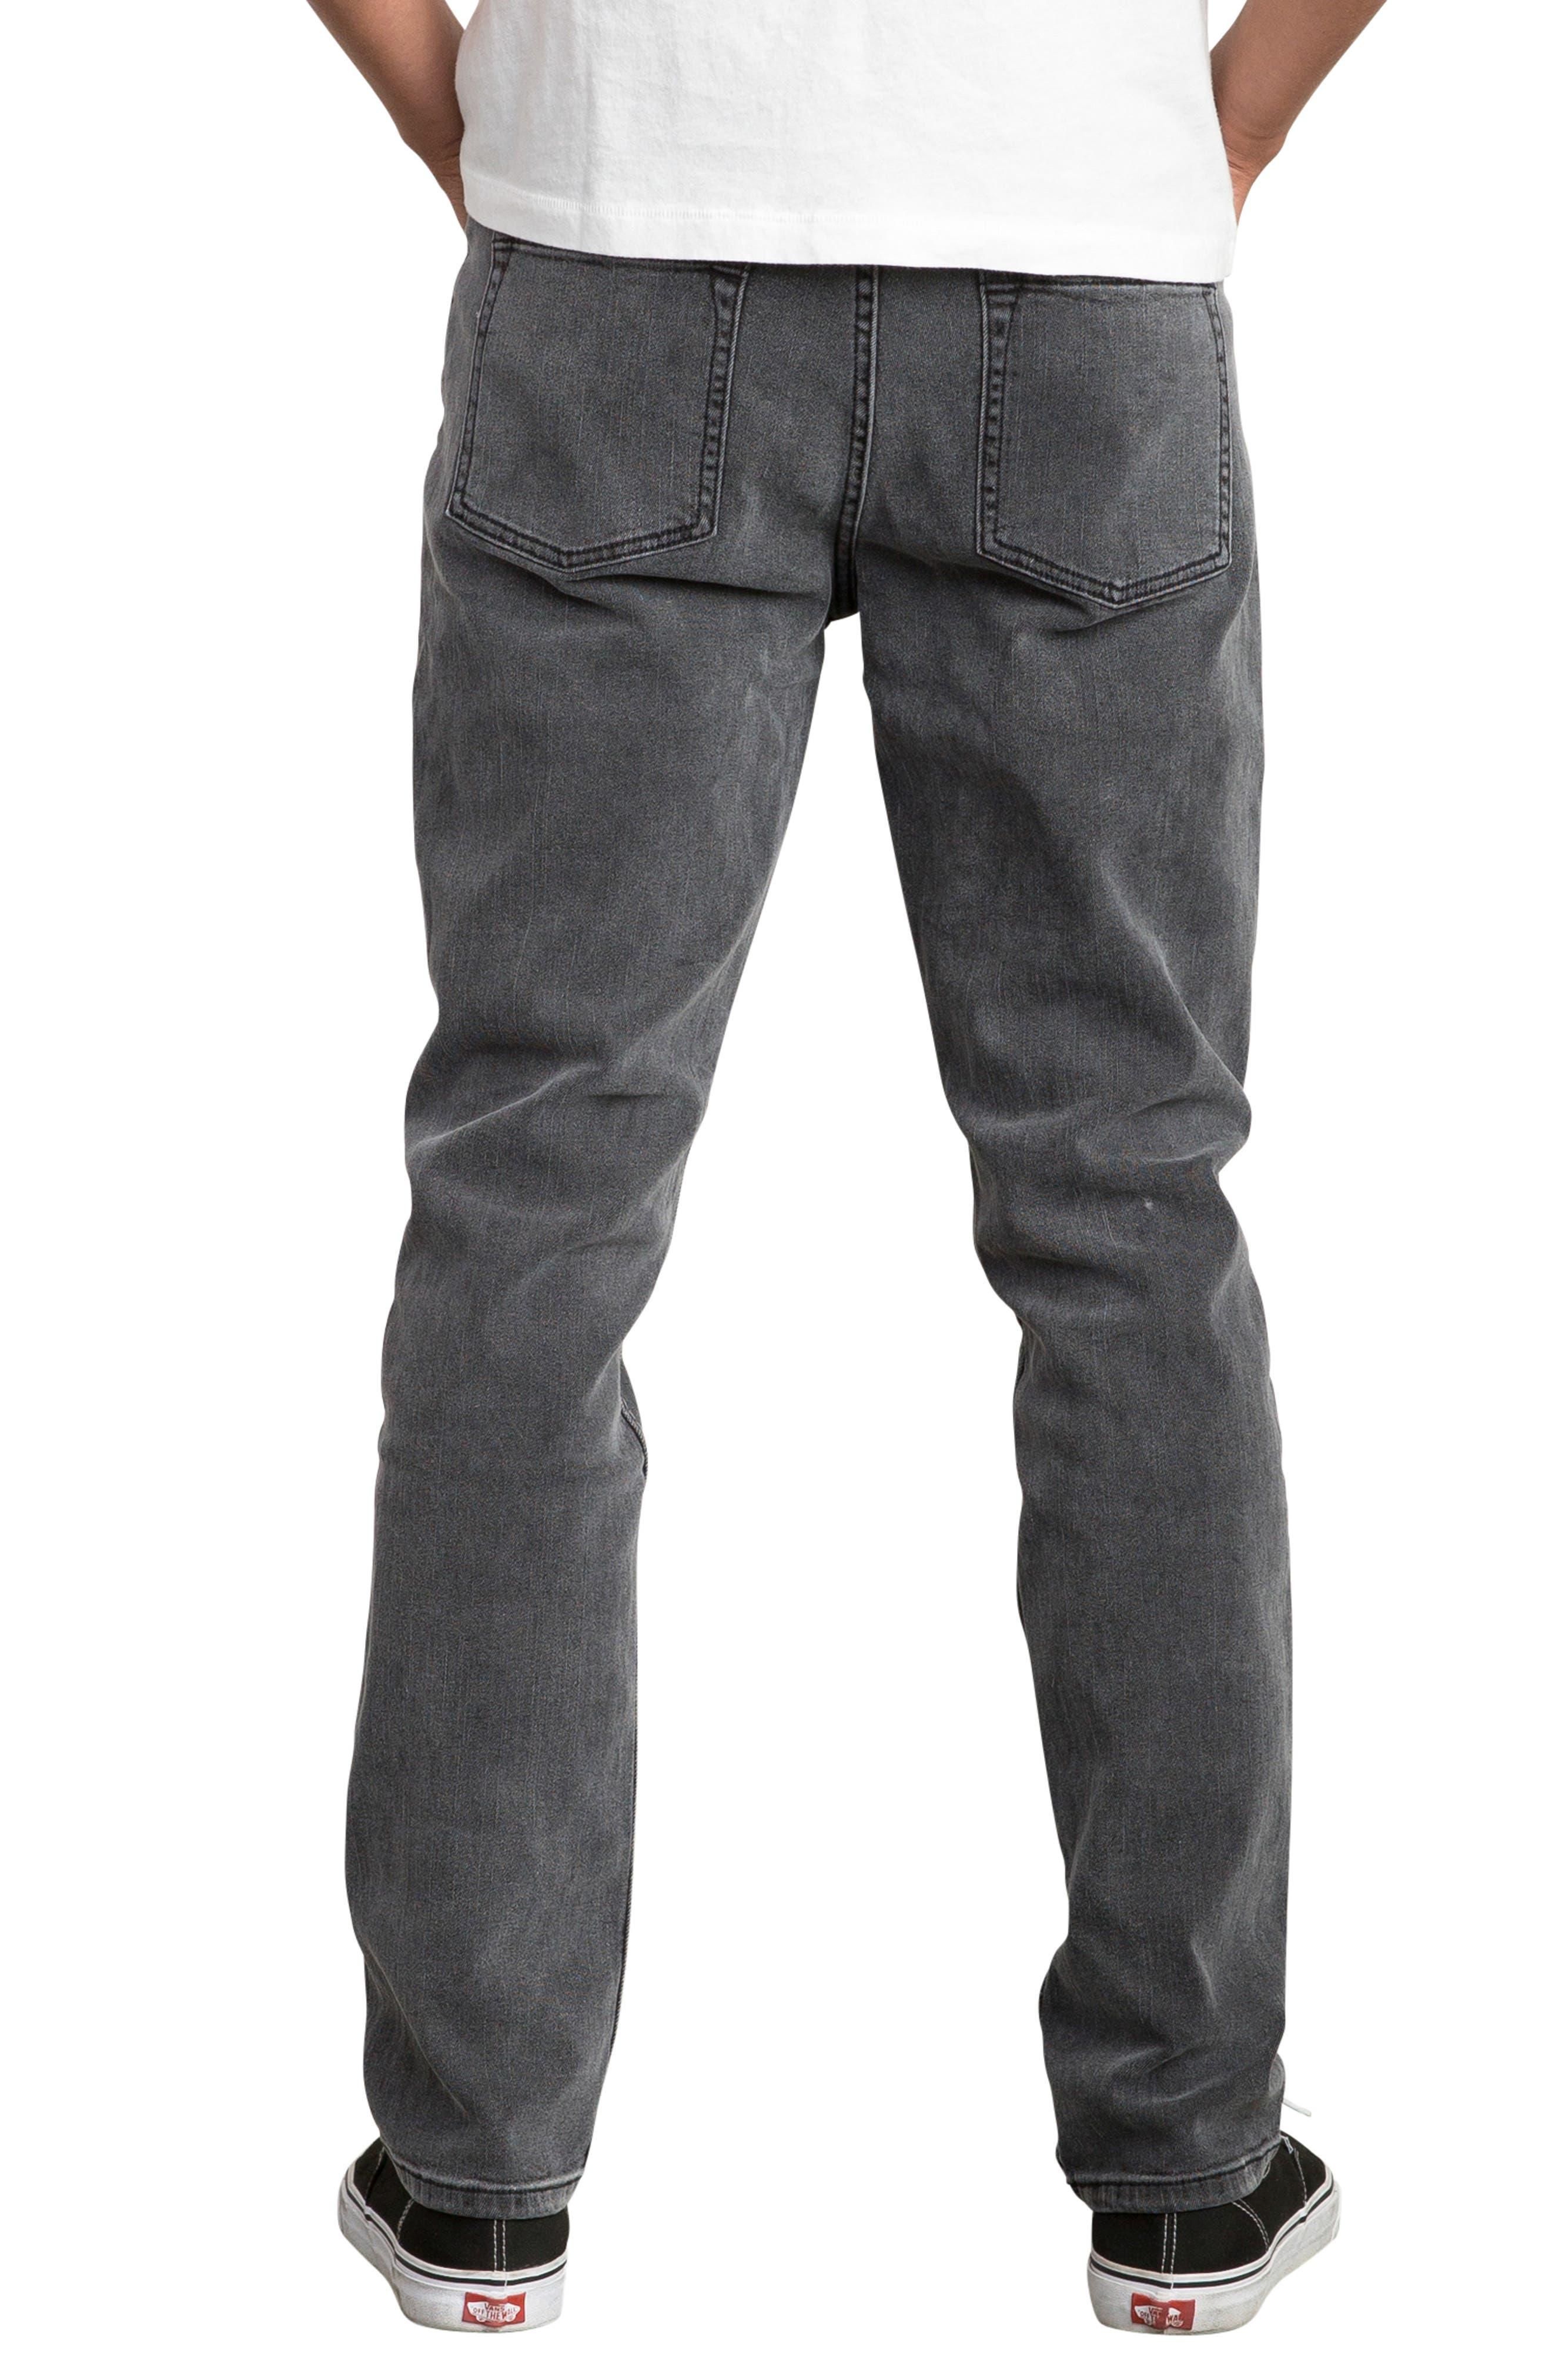 Daggers Slim Straight Leg Jeans,                             Alternate thumbnail 2, color,                             VINTAGE CHARCOAL